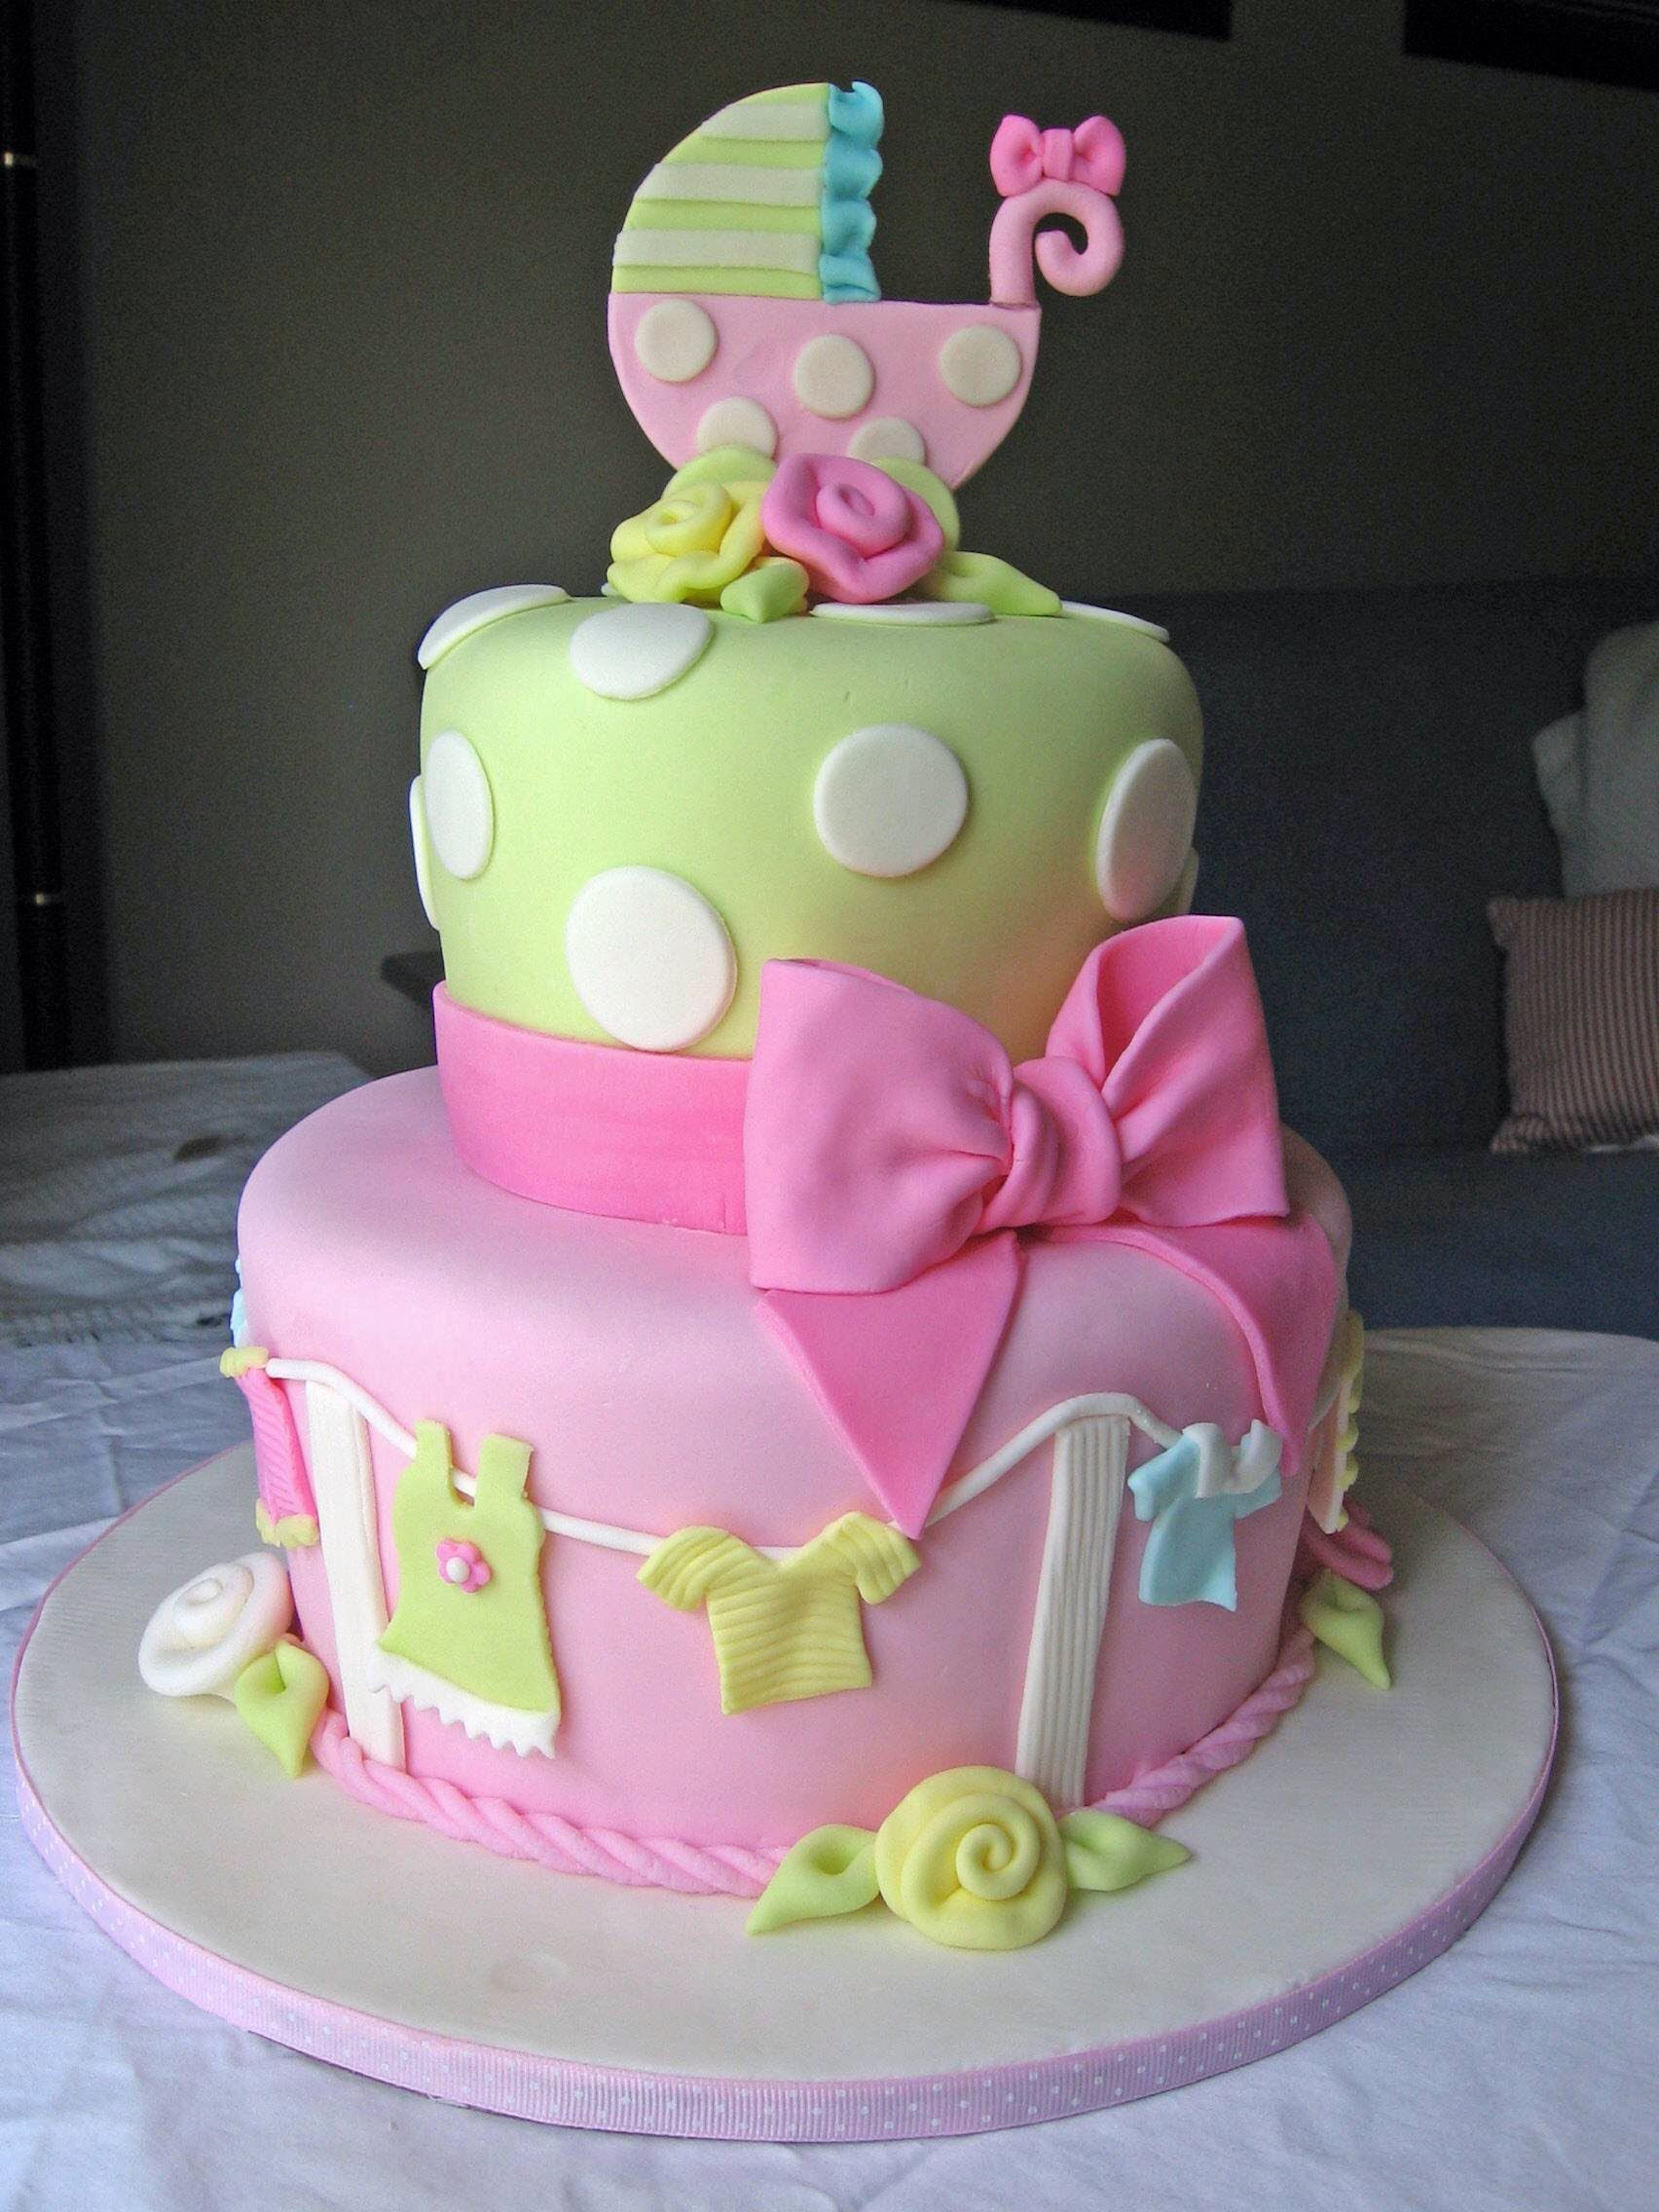 Cute Baby Cake Images : Cute baby girl shower cake Baby Stuff Pinterest